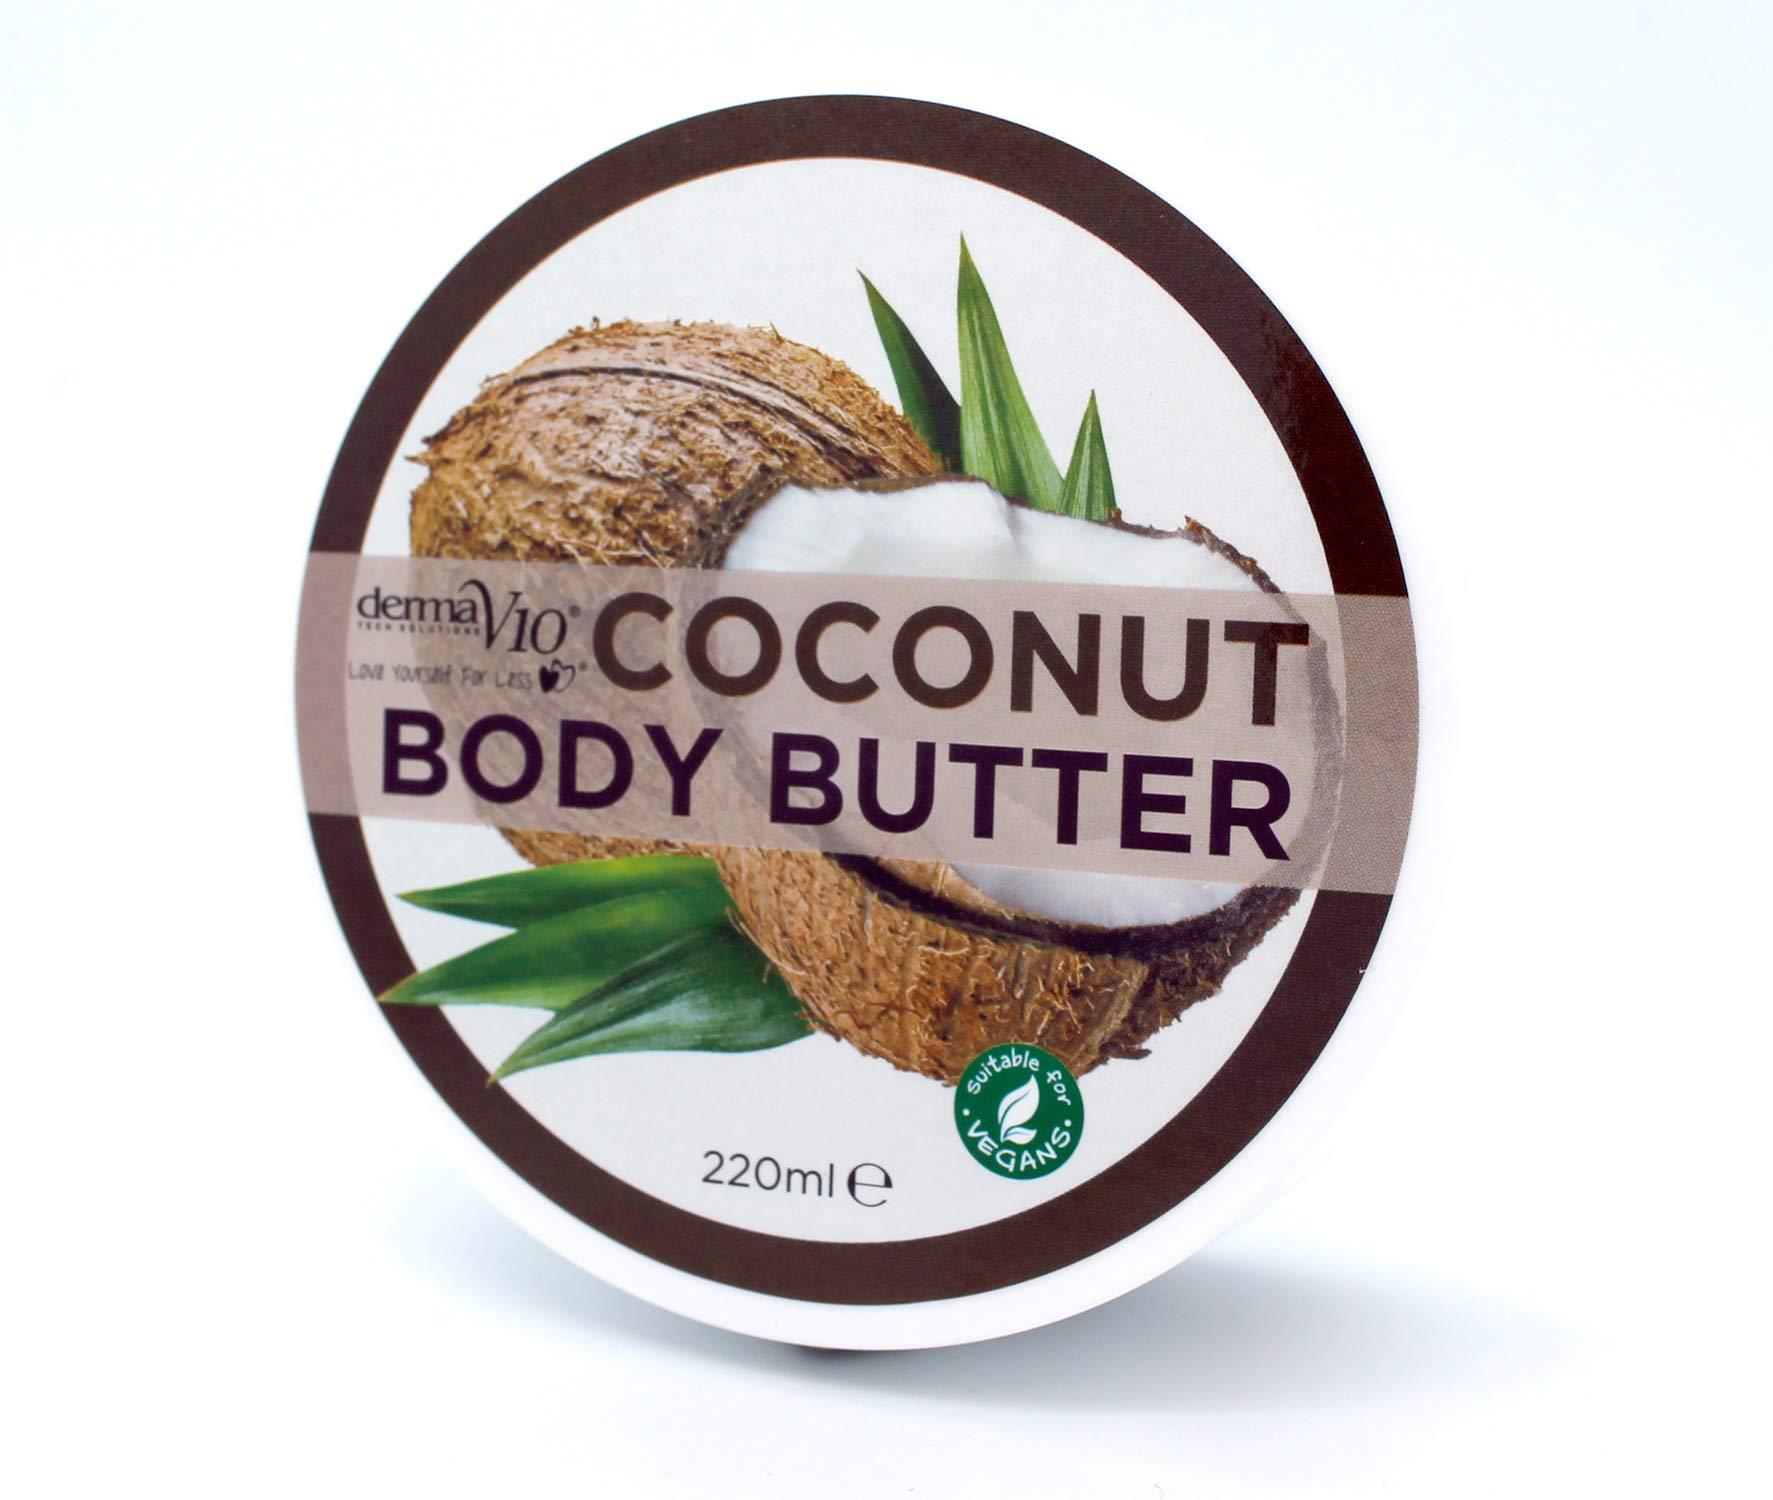 Derma V10 COCONUT Body Butter 220ml